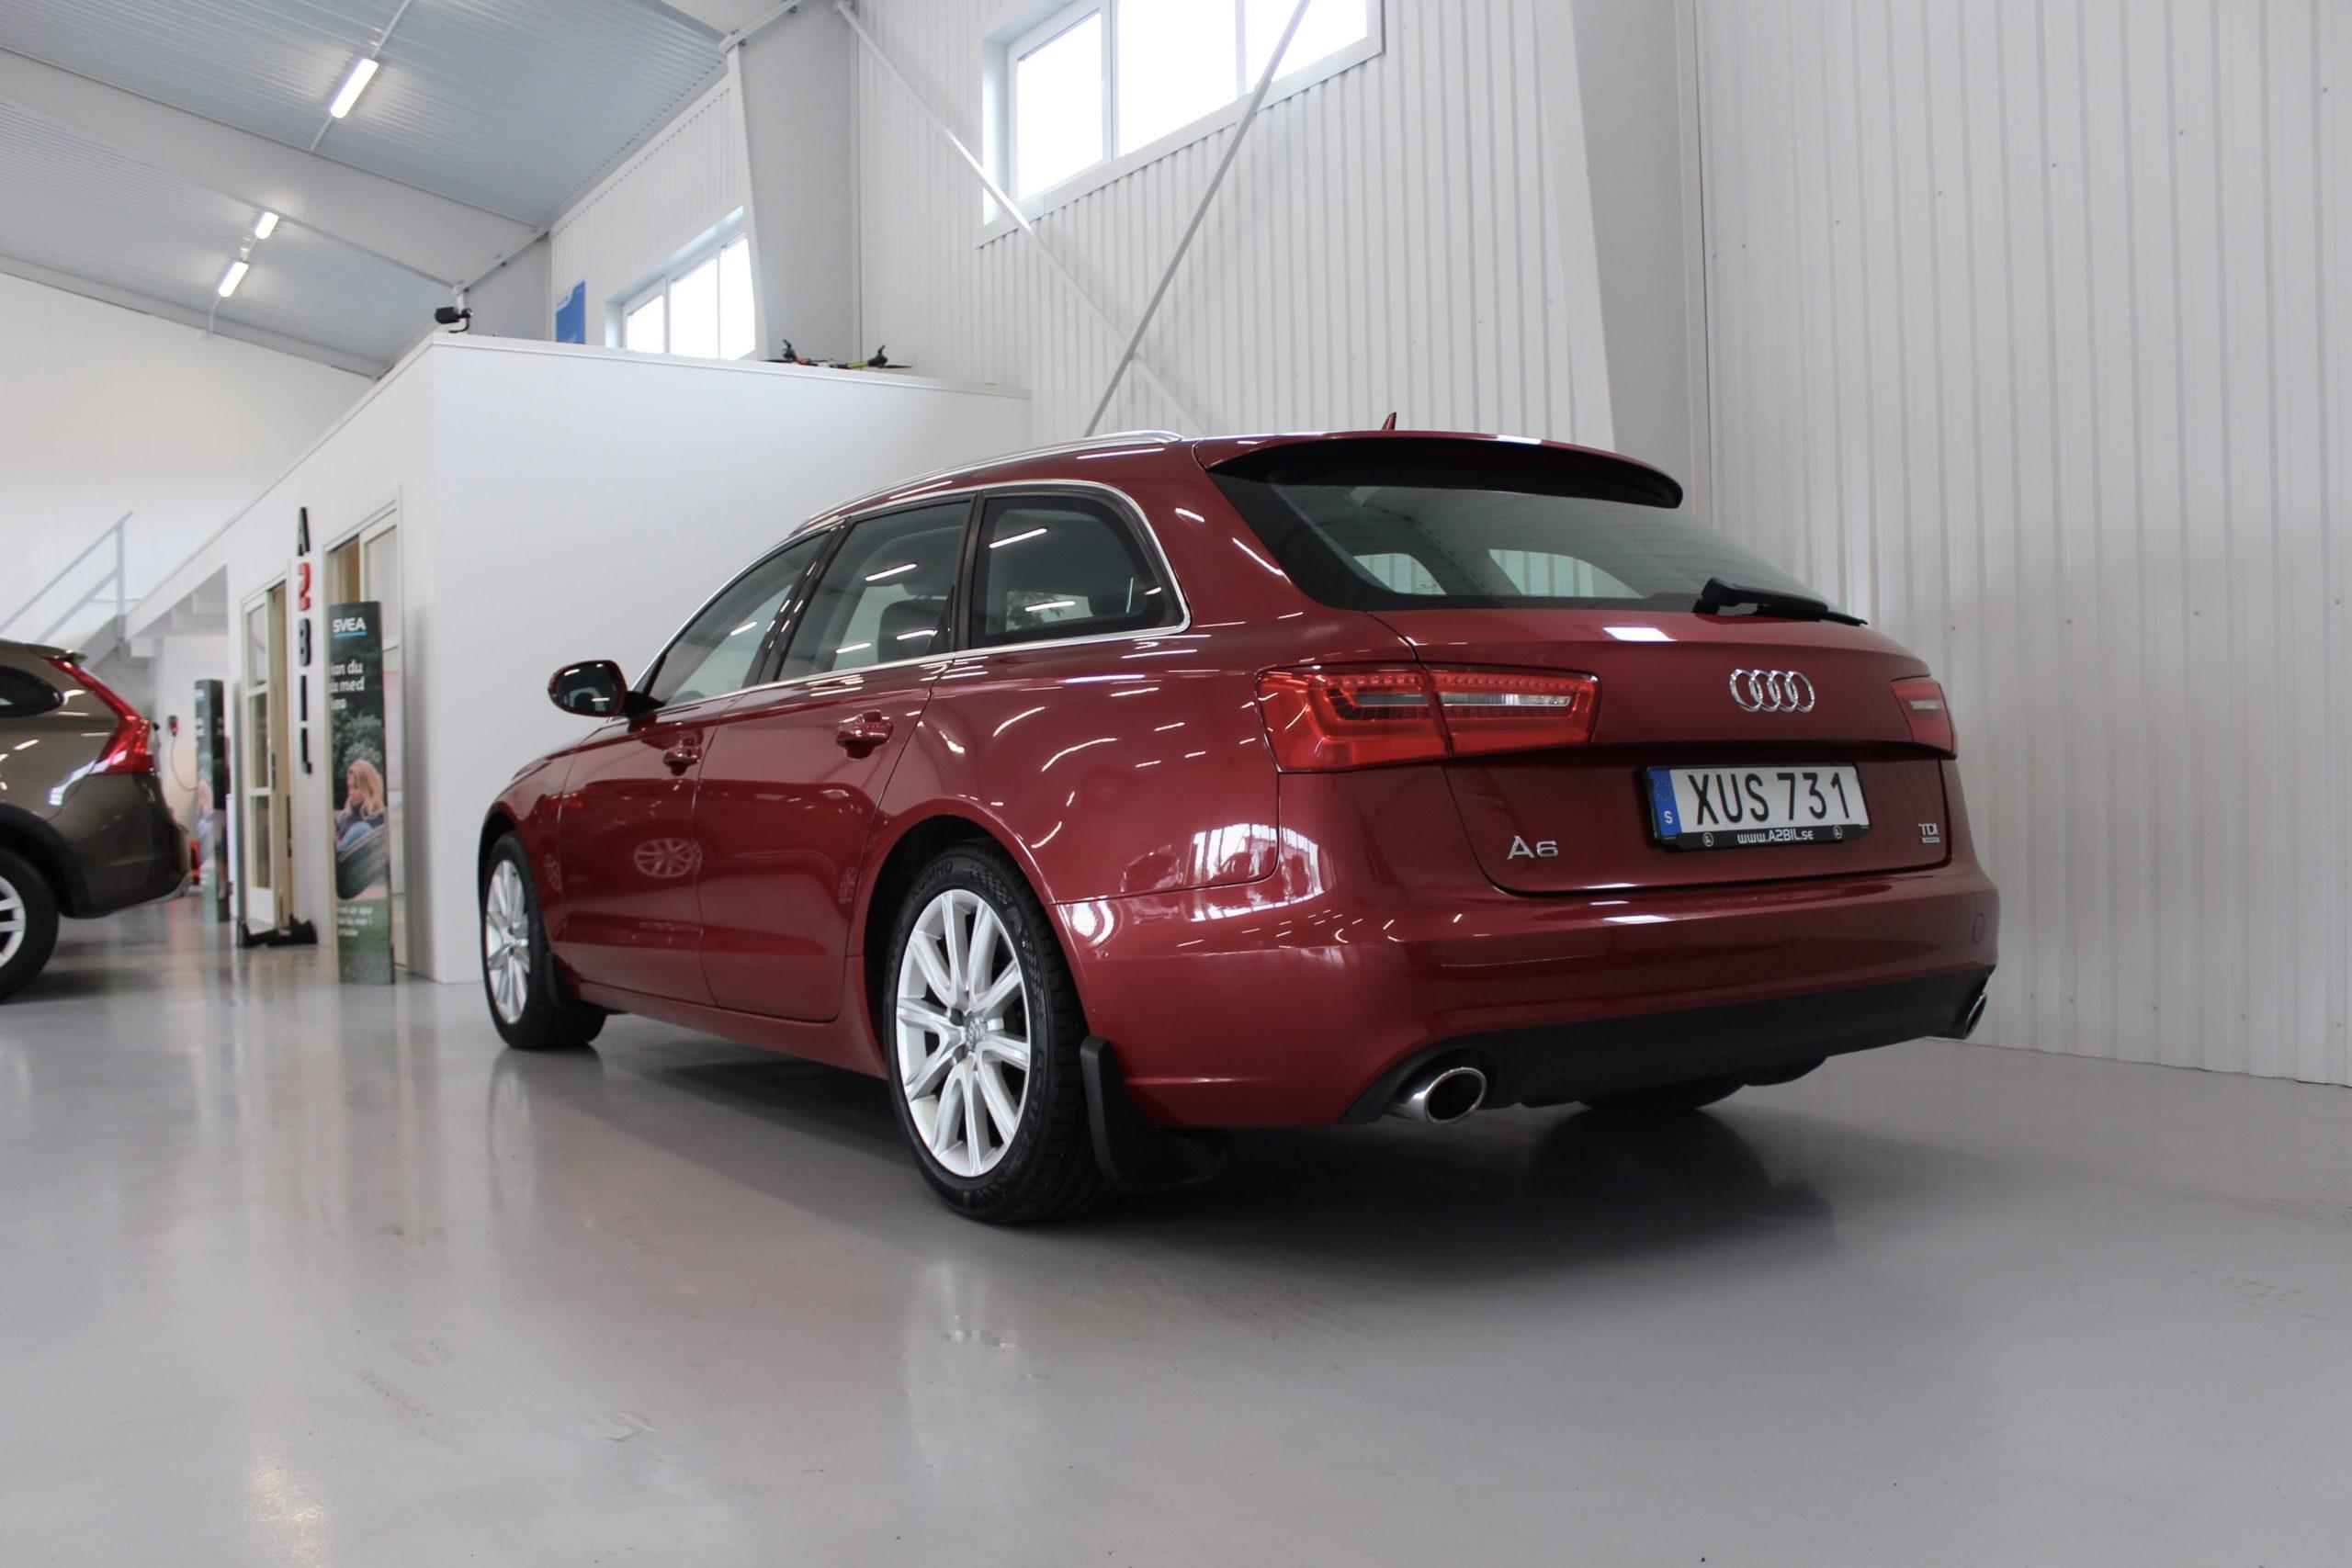 Audi A6 Avant 3.0 TDI V6 DPF Quattro S Tronic Proline 245hk